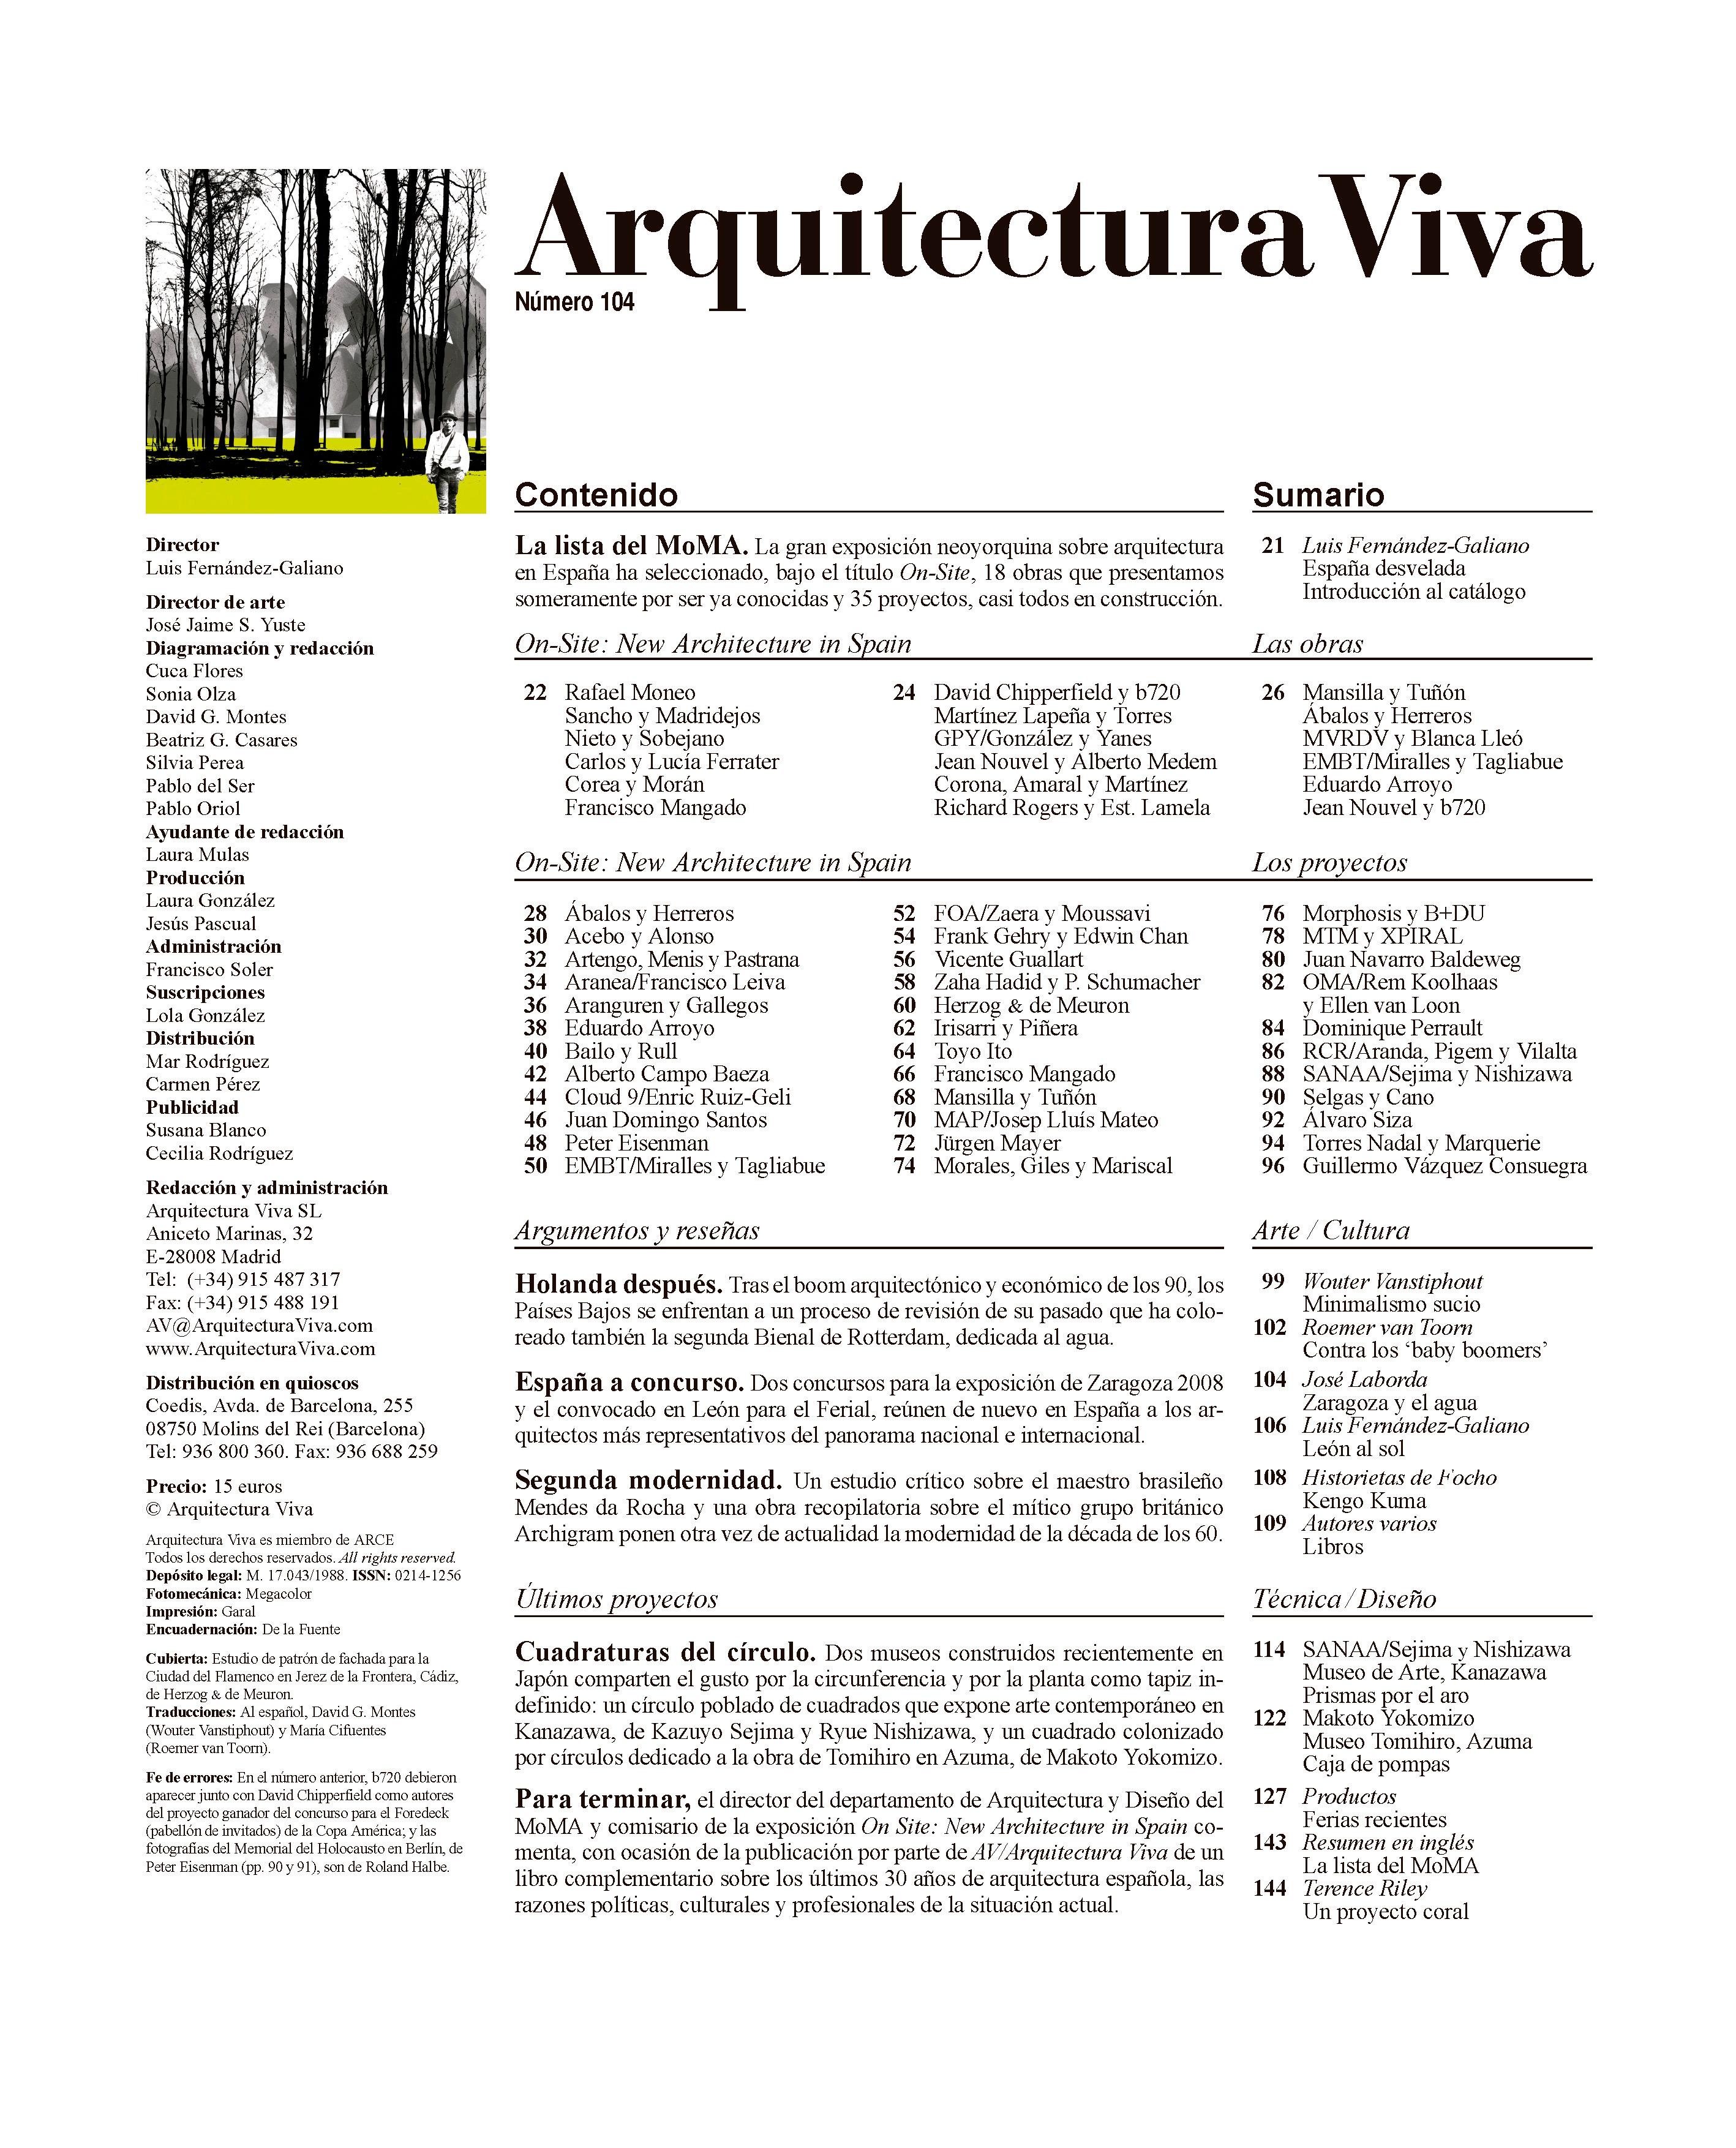 La lista del MoMA